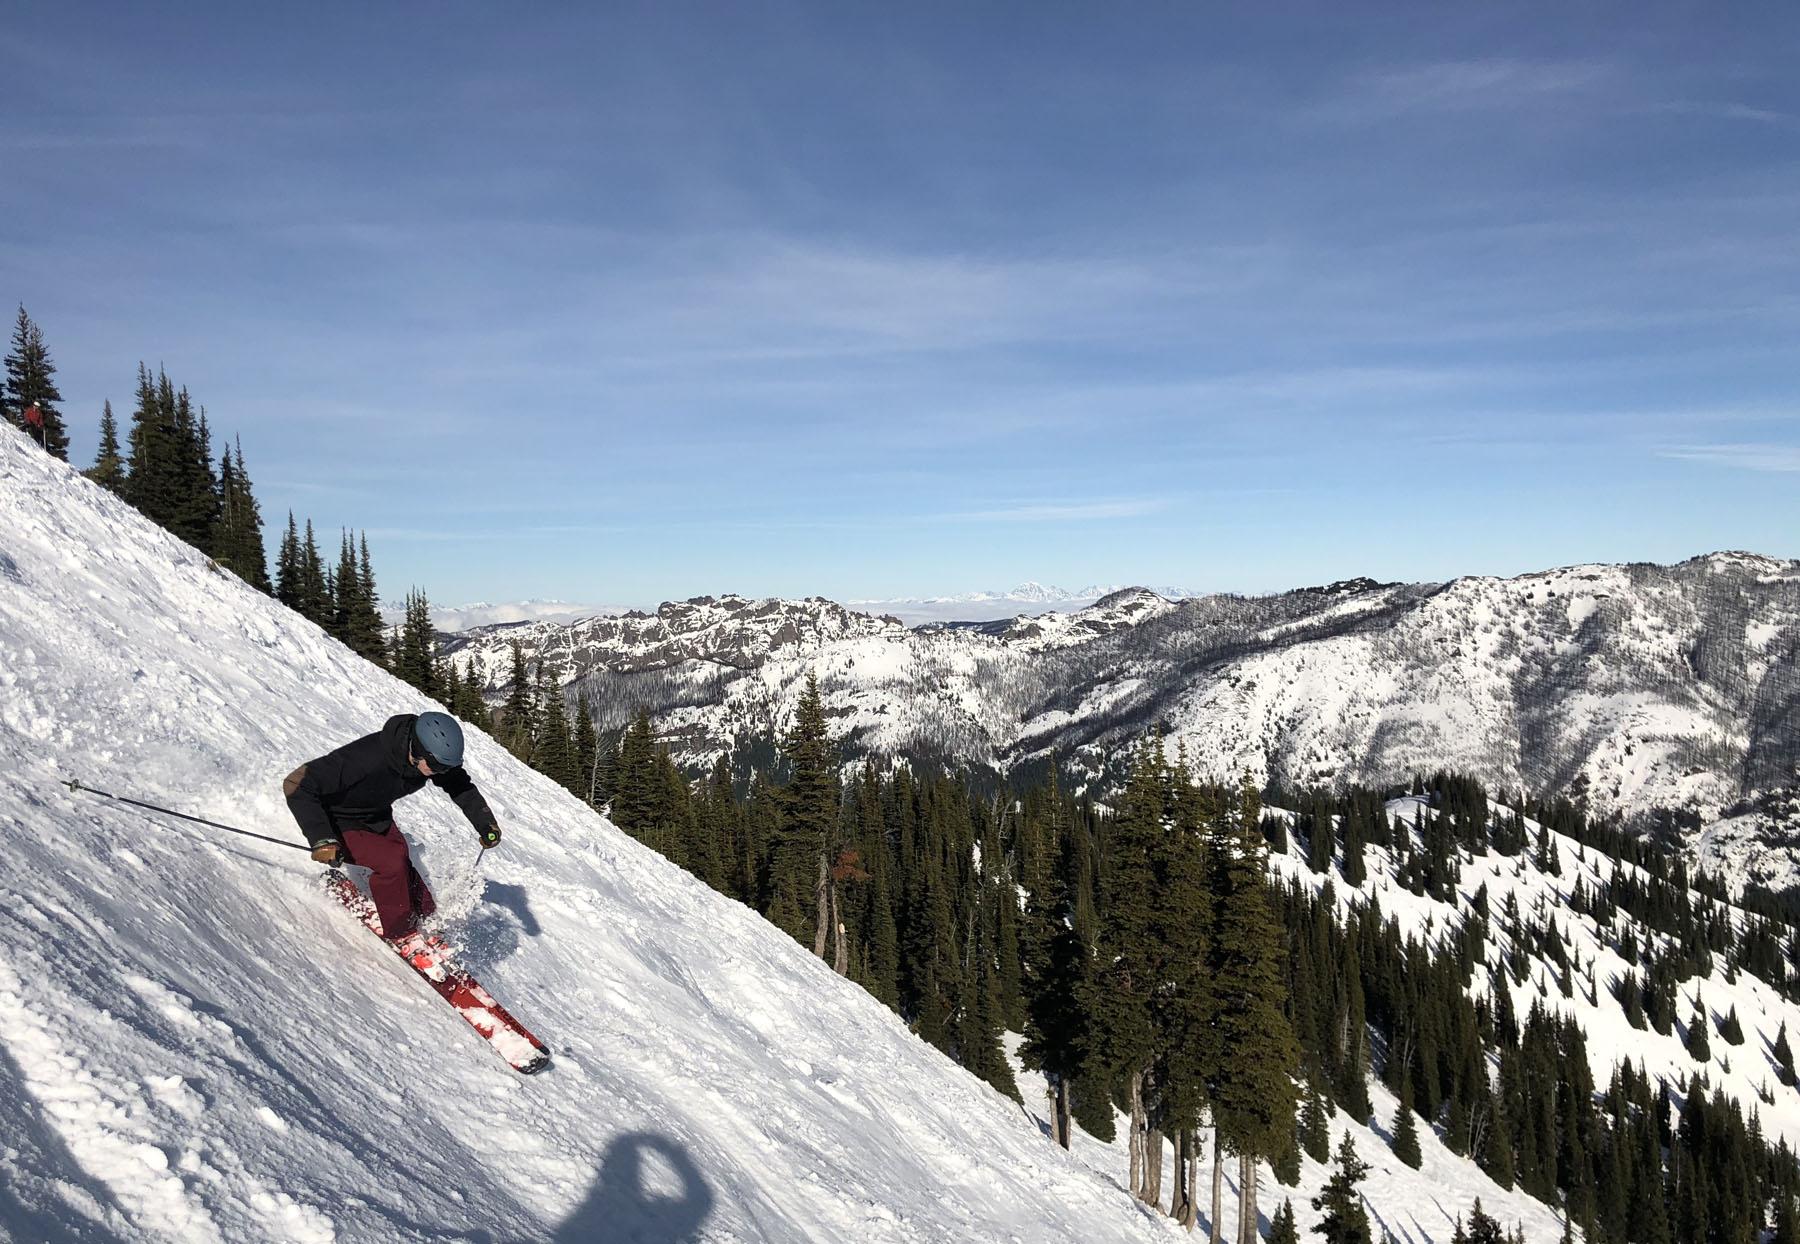 washington ski resort reviews | familyskitrips